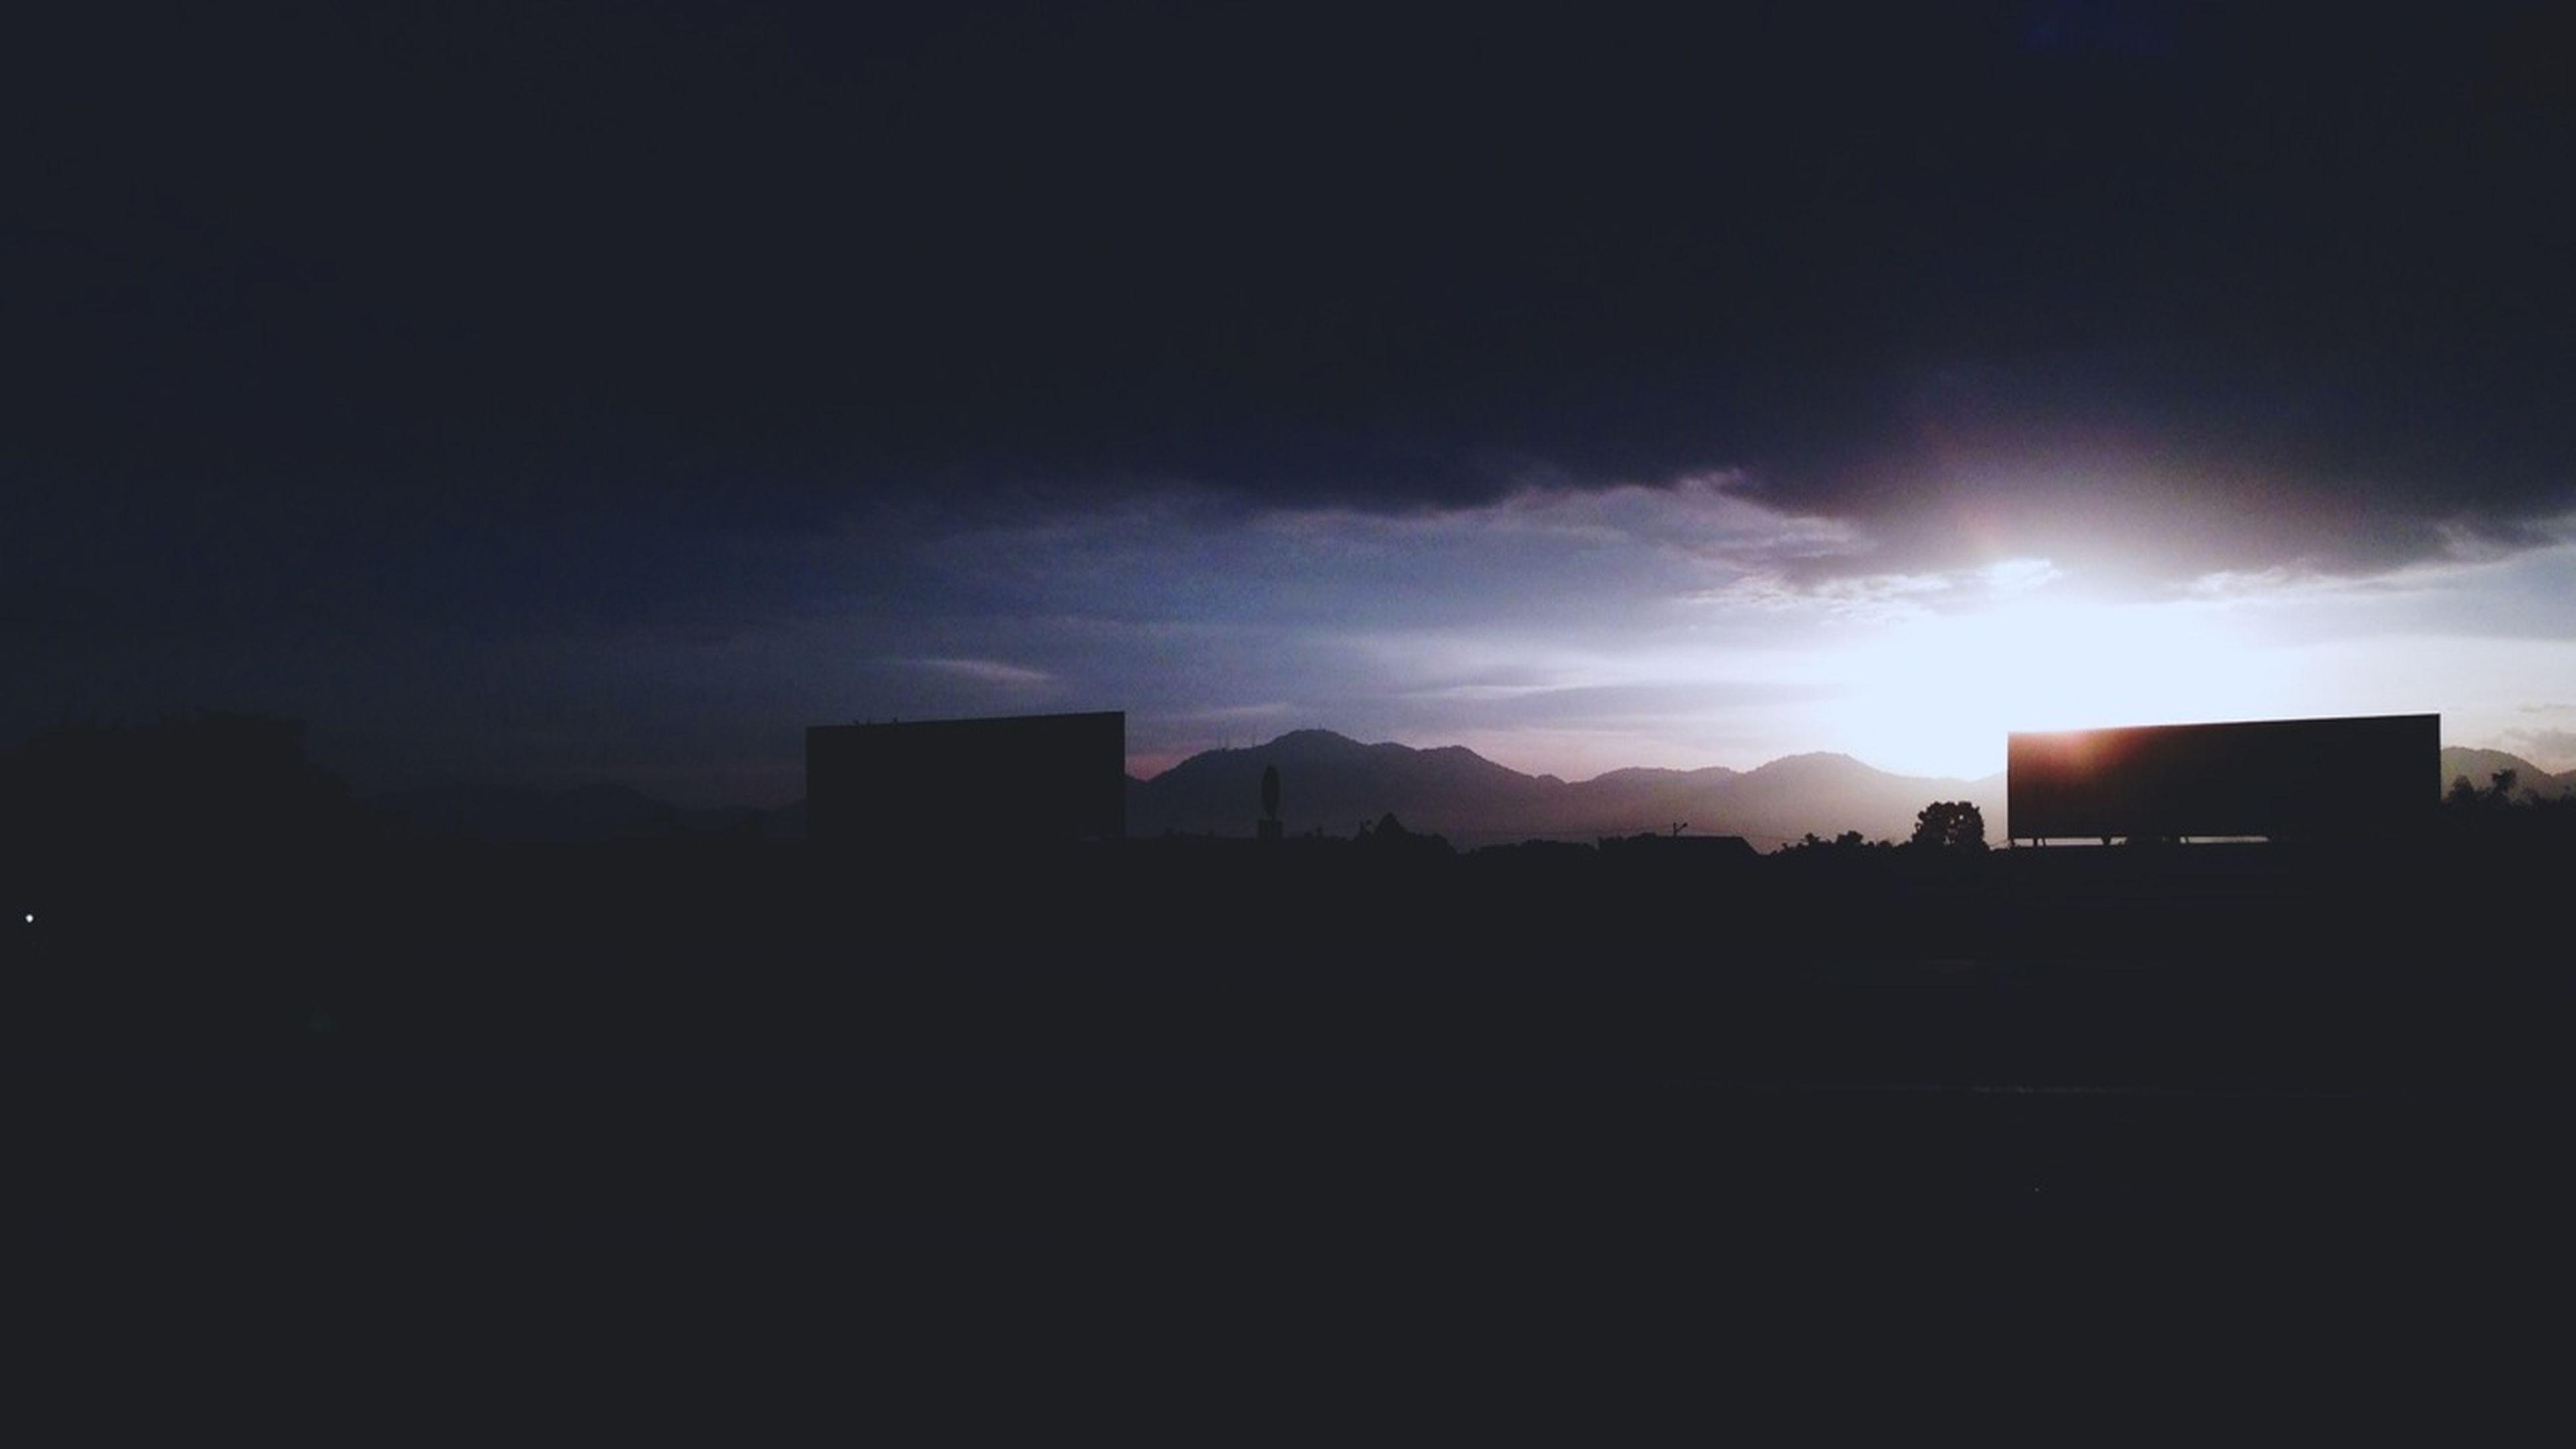 building exterior, silhouette, architecture, built structure, sky, sunset, sun, cloud - sky, city, sunlight, dark, sunbeam, cloud, cloudy, building, outdoors, no people, residential building, cityscape, scenics